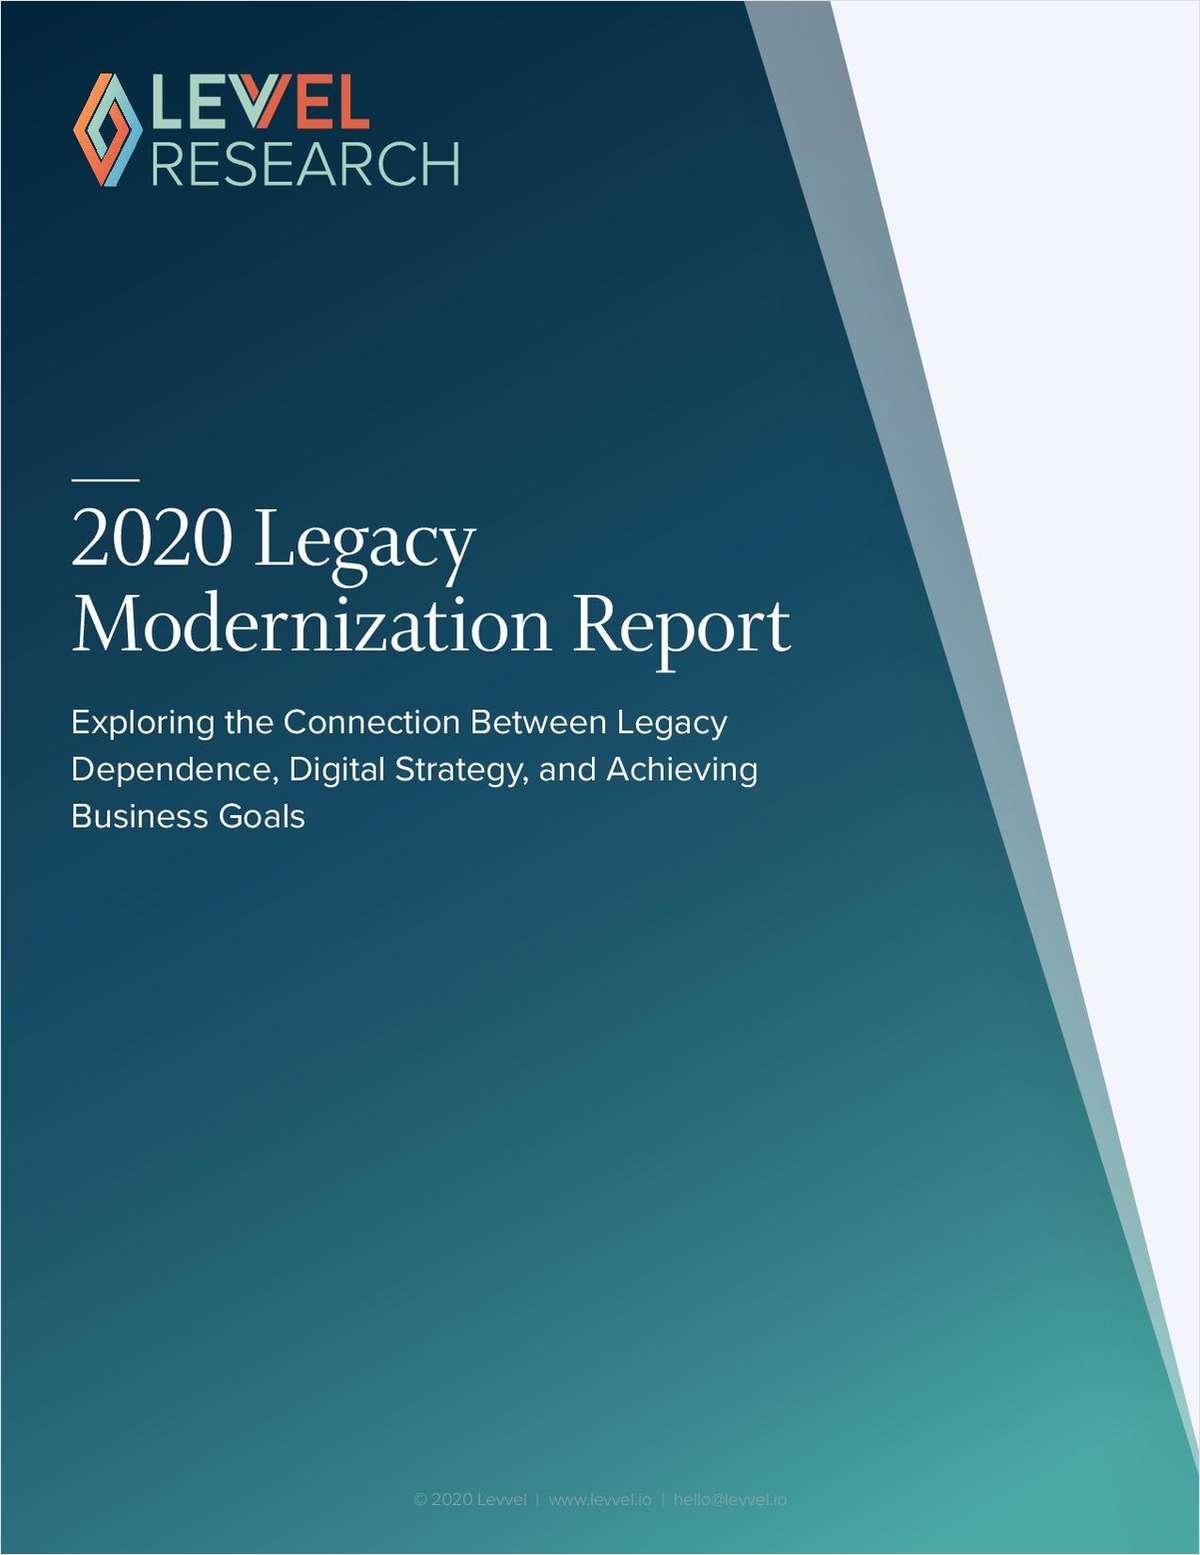 2020 Legacy Modernization Report